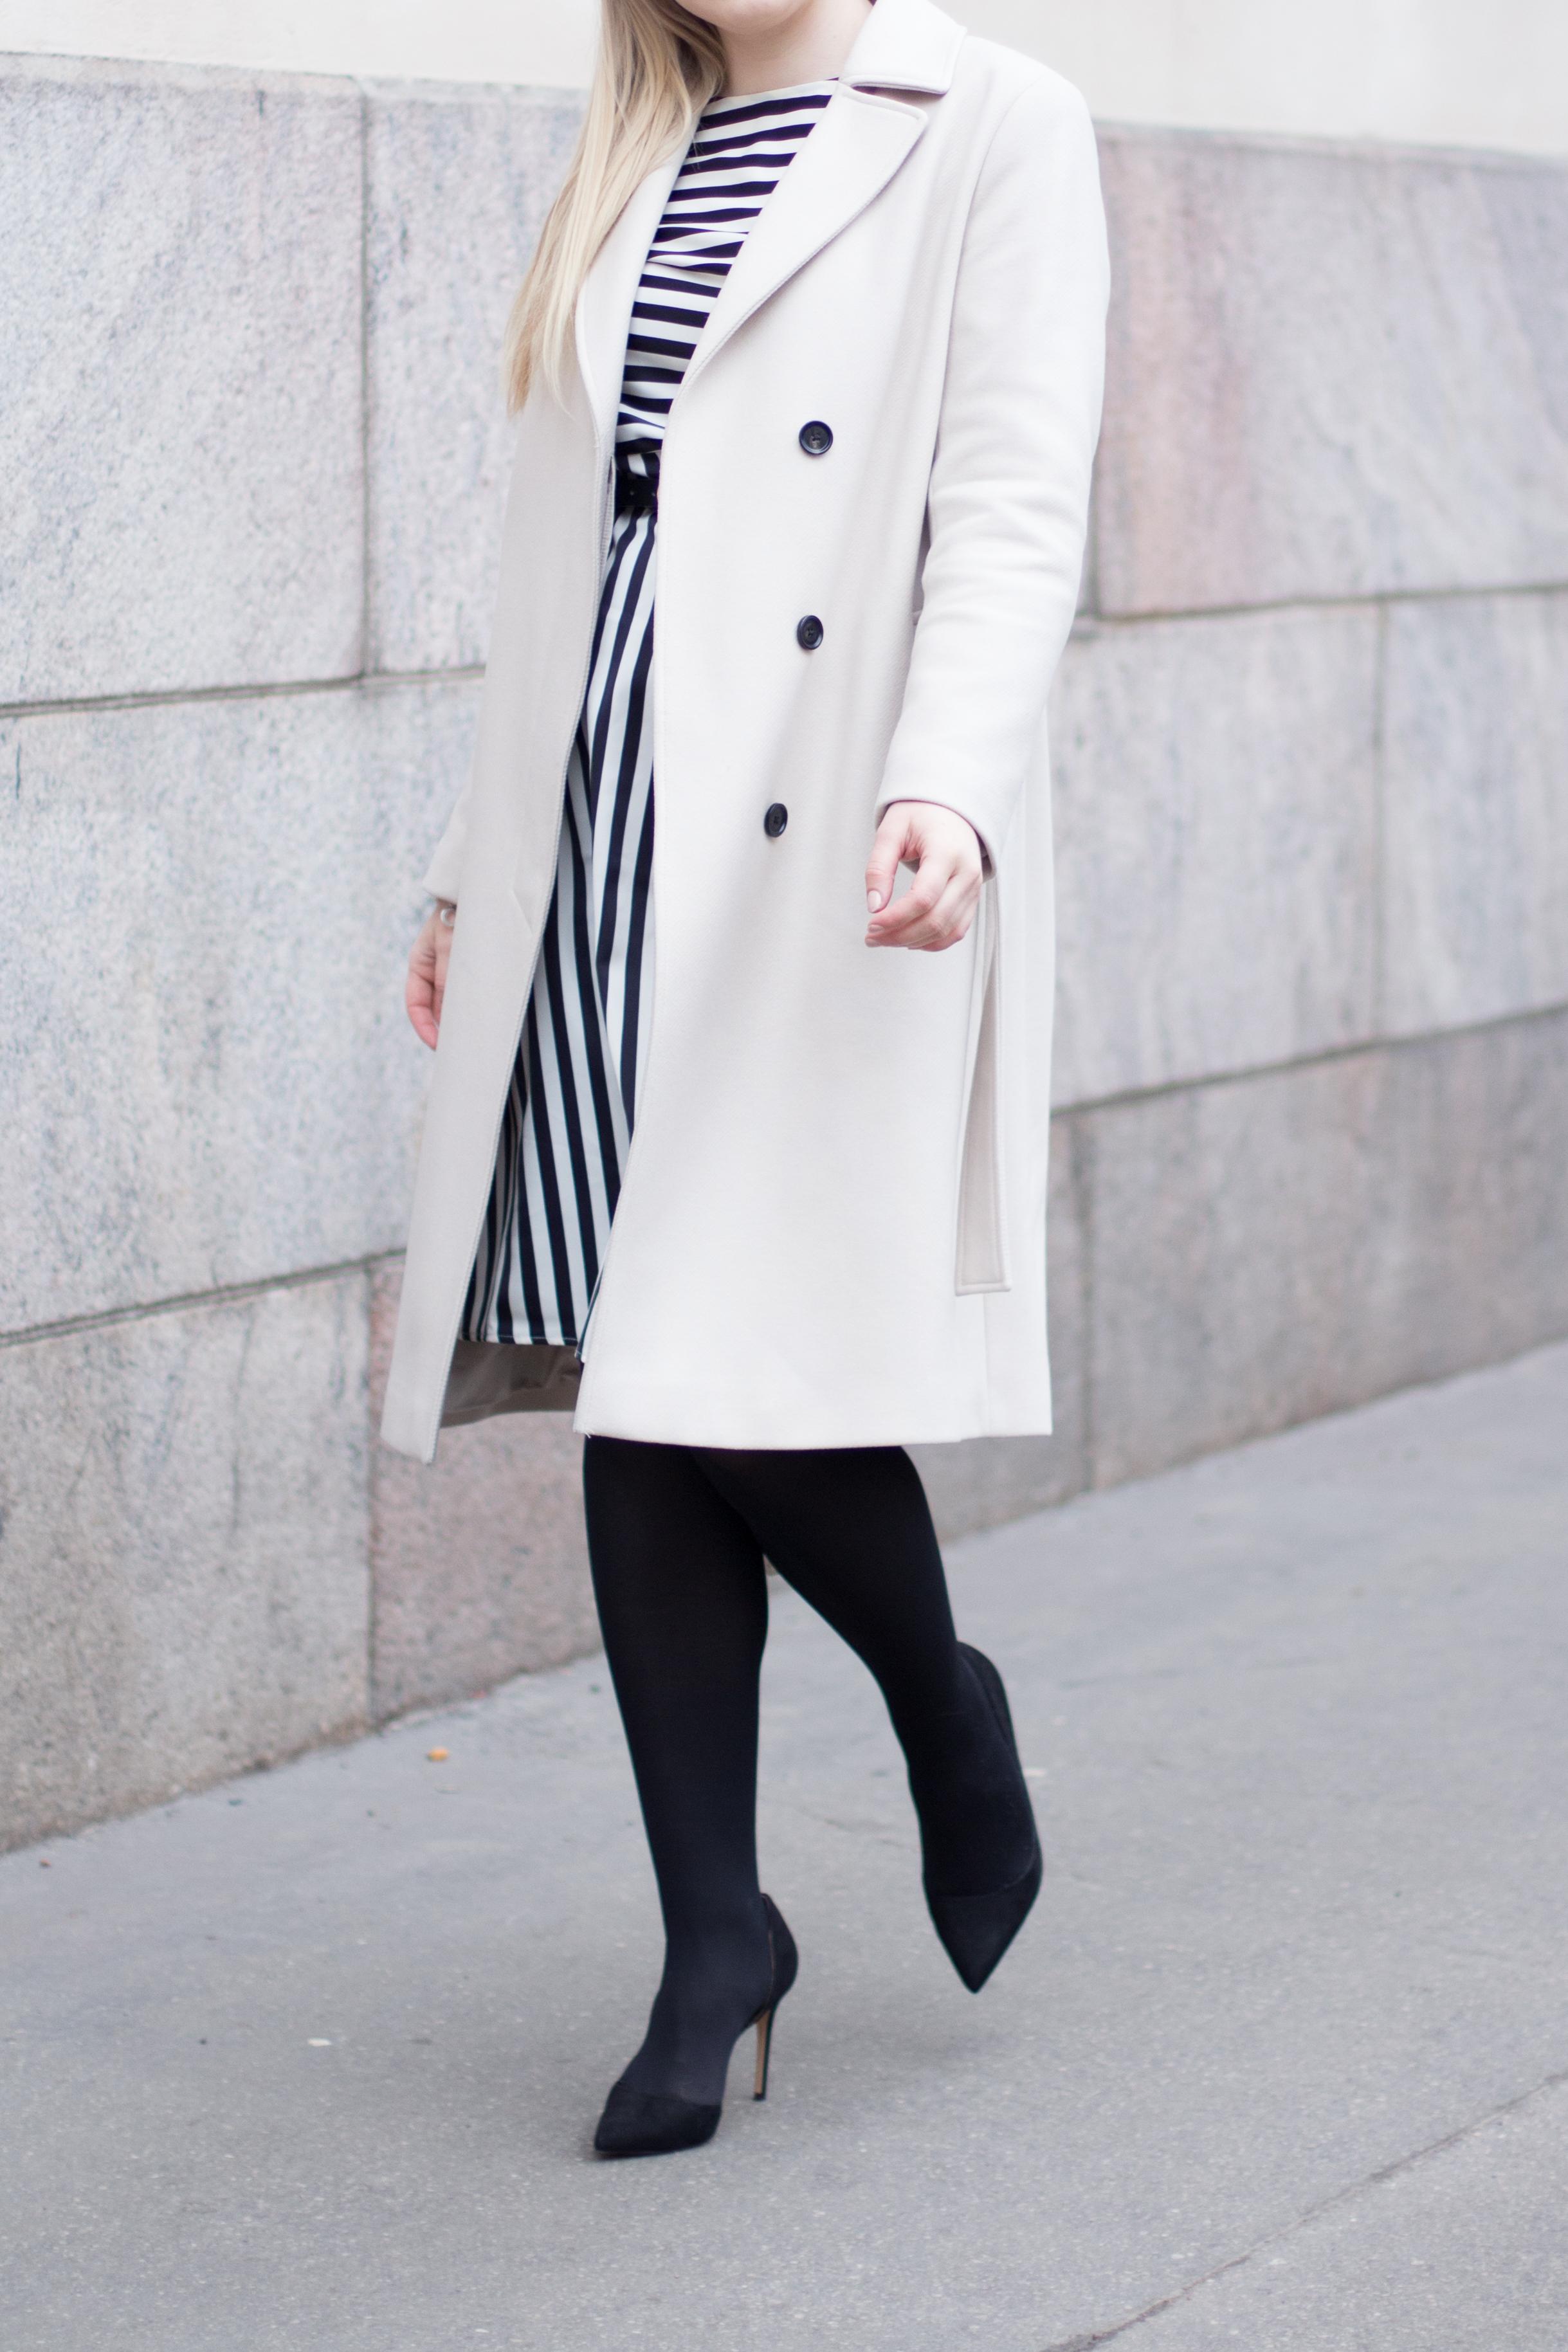 black and white dress (9 of 13).jpg